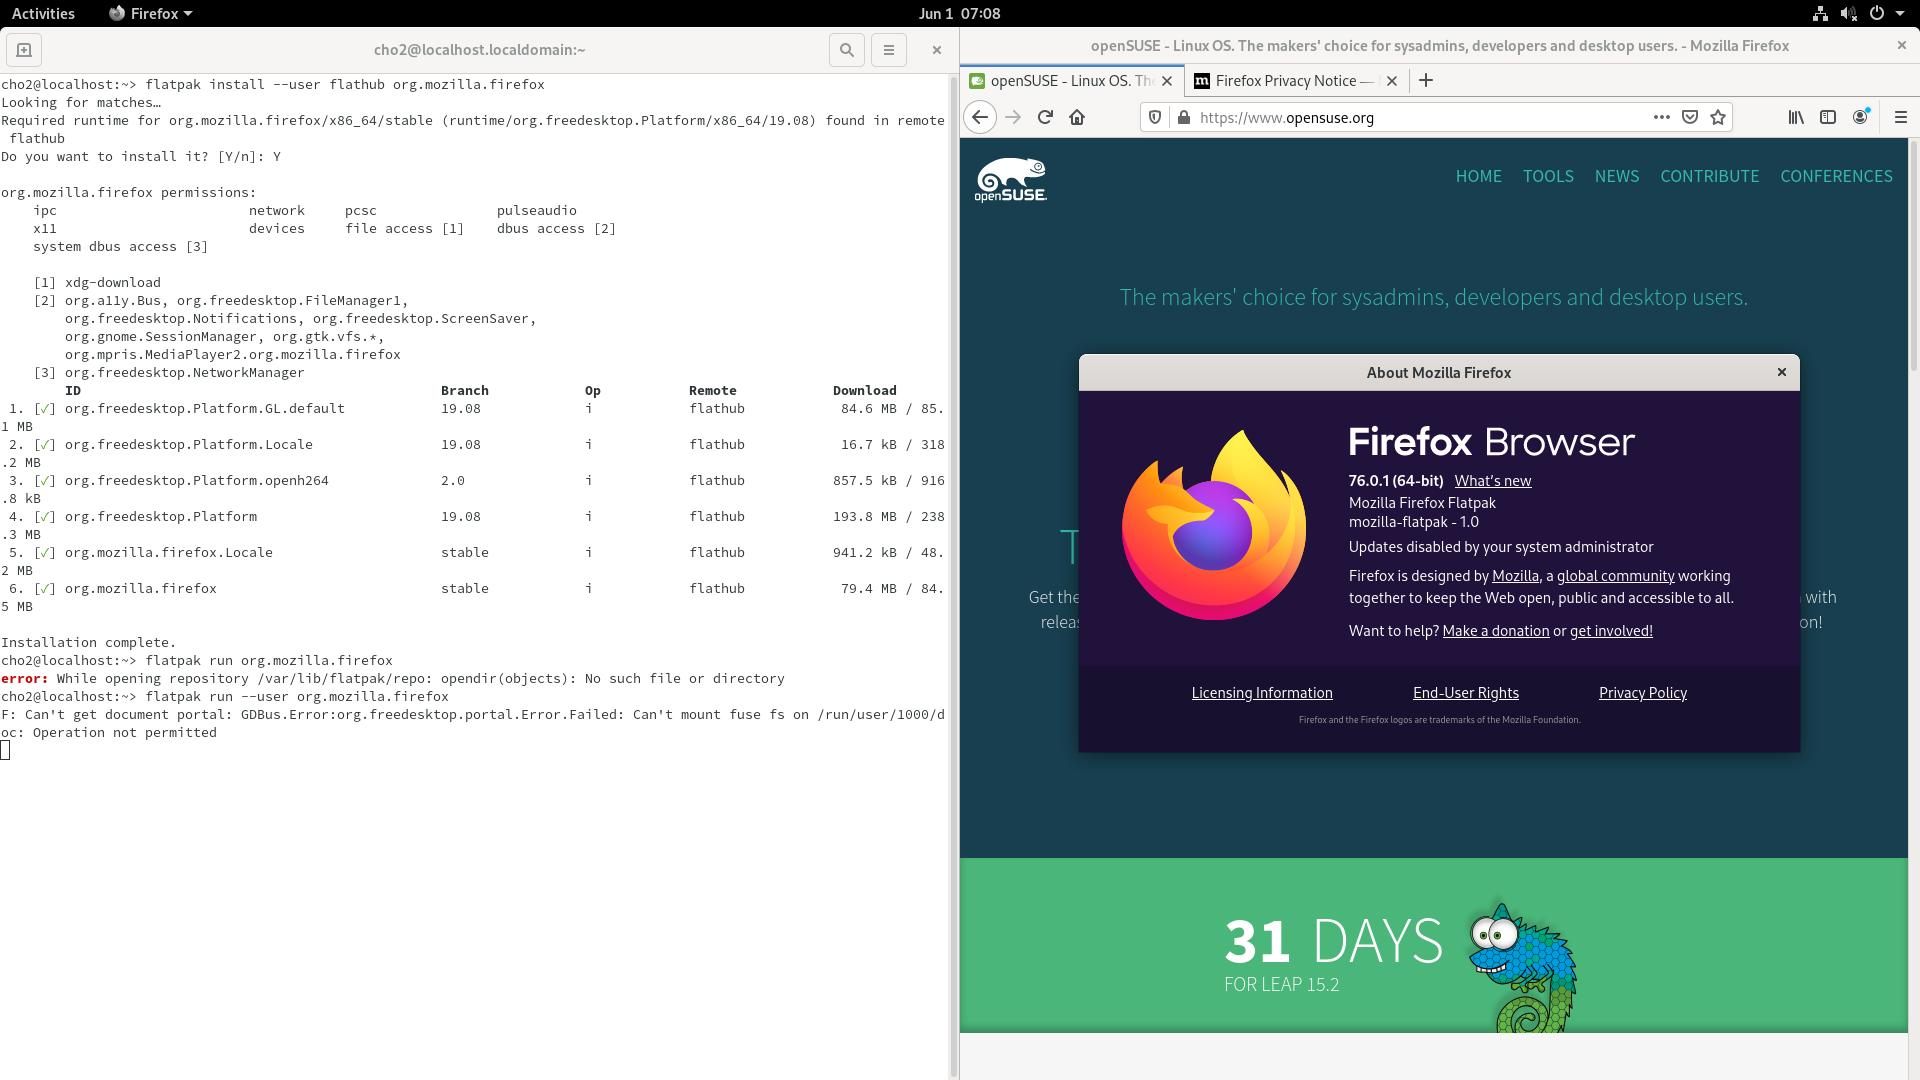 https://gitlab.com/cho2/blog-images/-/raw/master/2020-06-01/run-firefox-flatpak.png